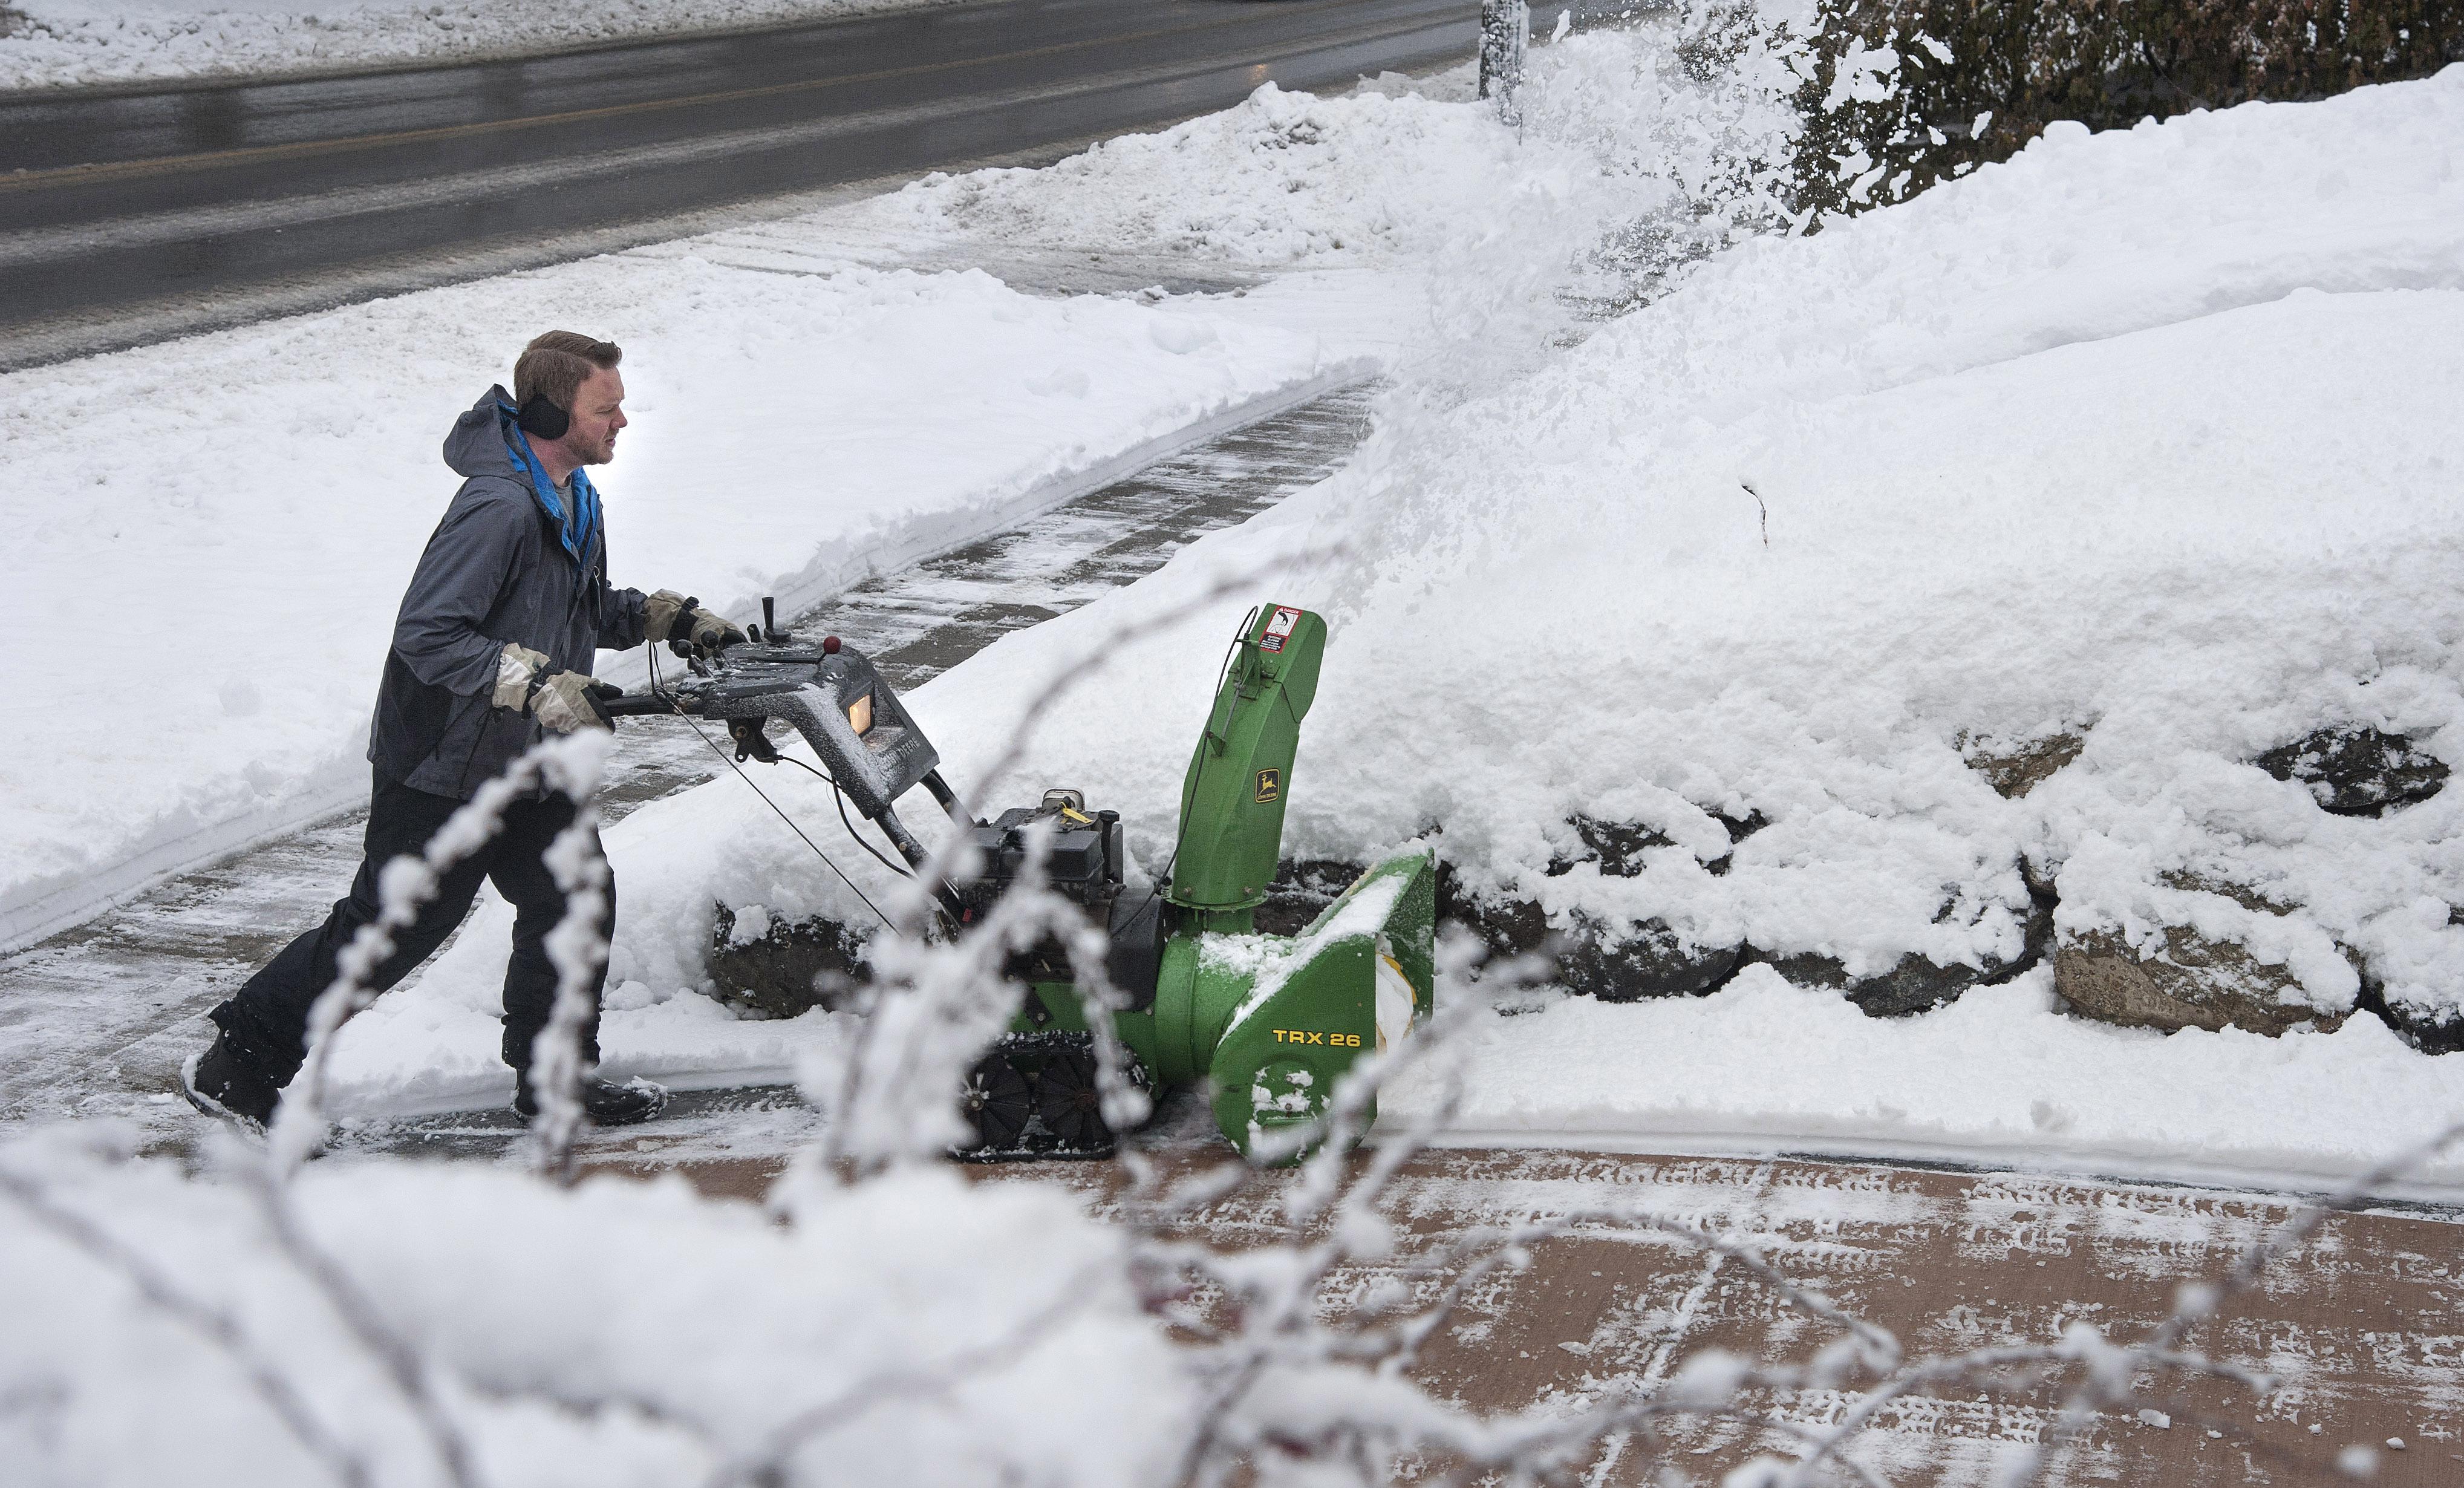 Snowfall winding down as Christmas arrives   The Spokesman-Review